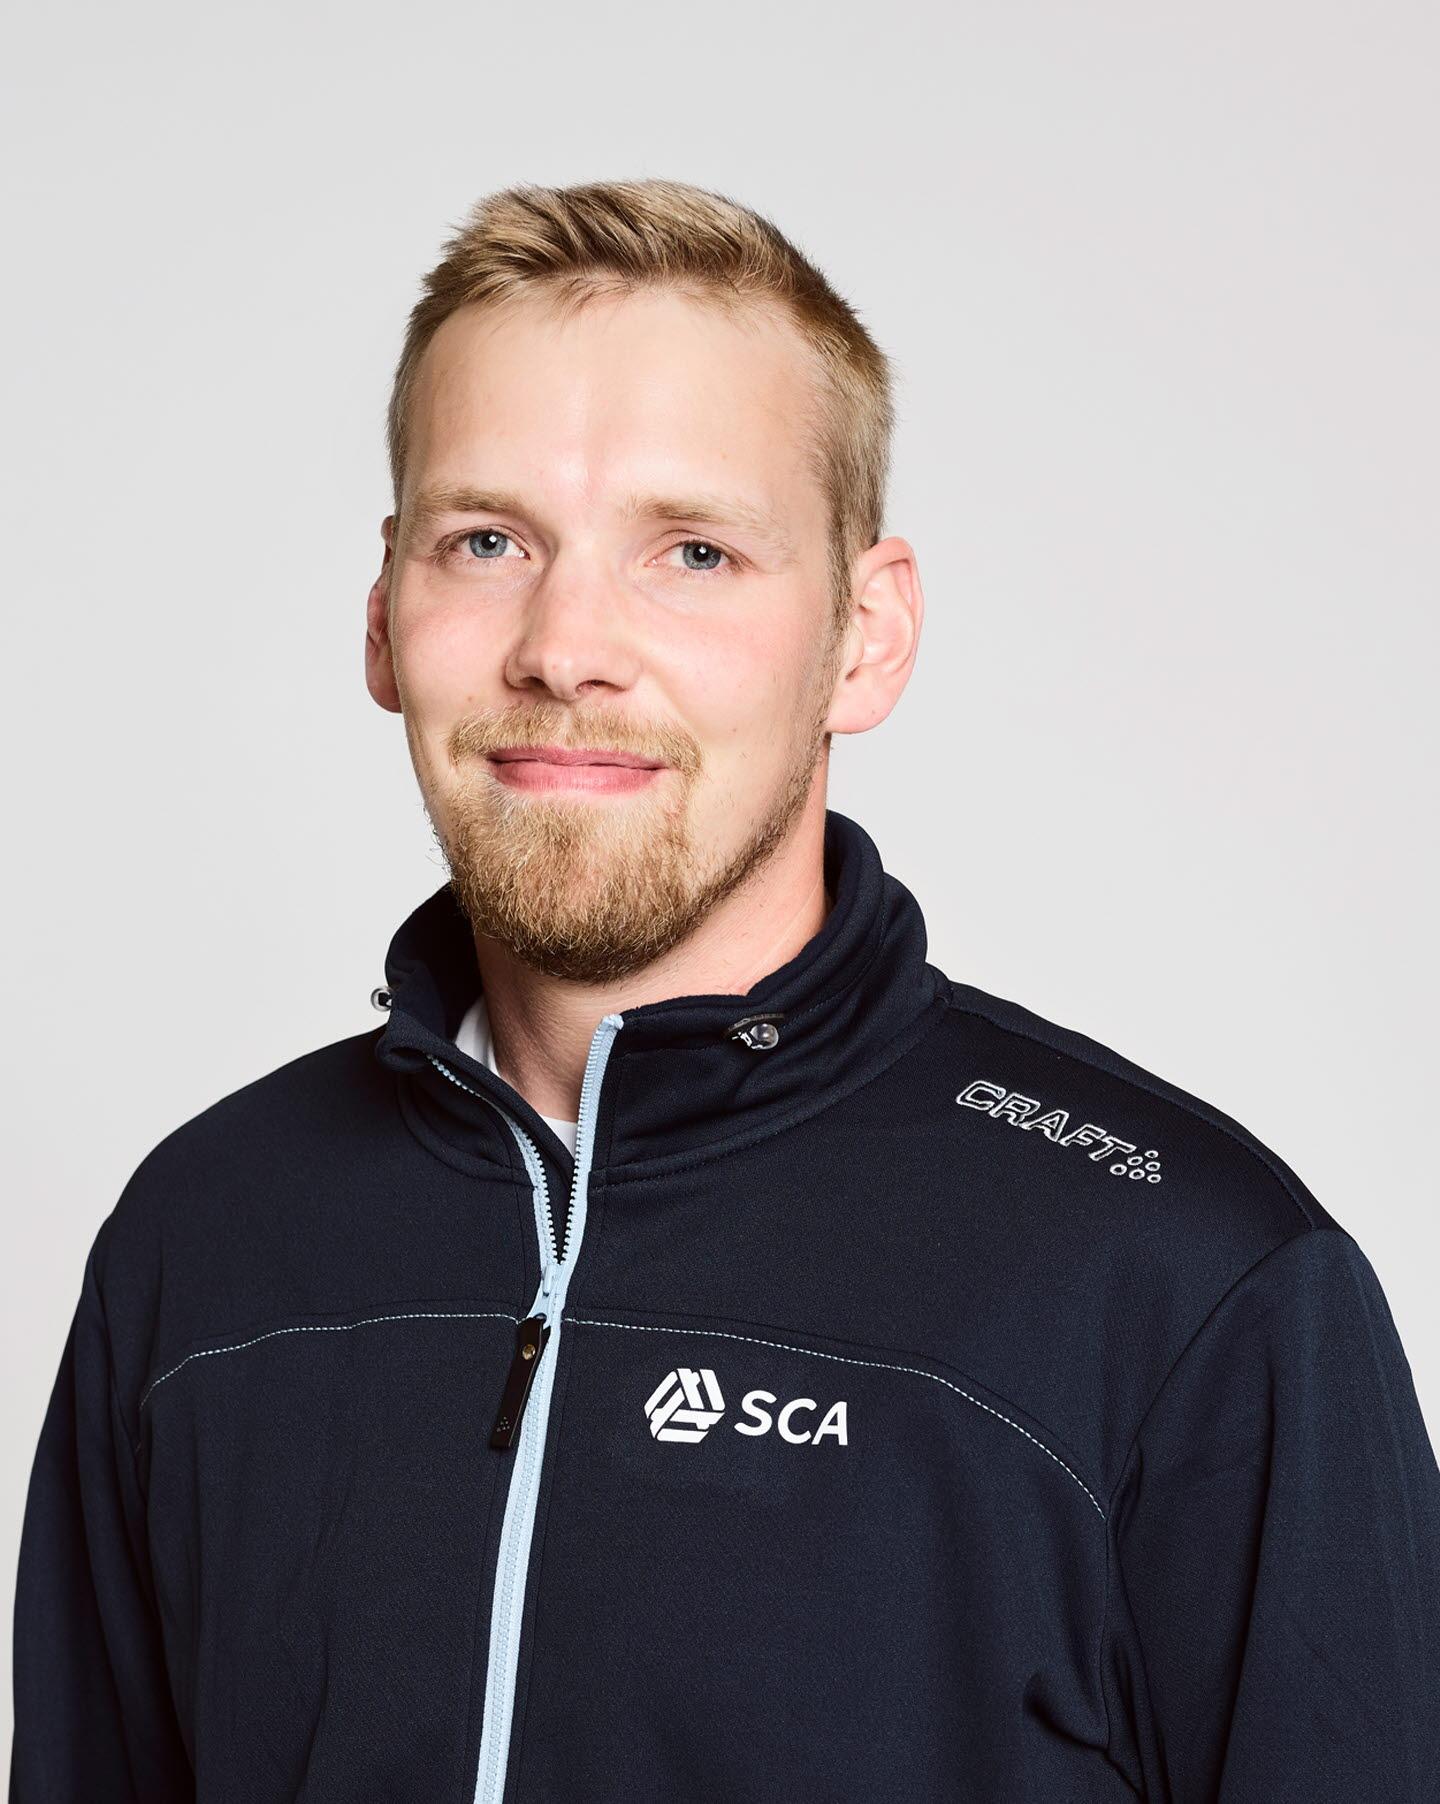 Gustav Persson virkesköpare Norrbotten